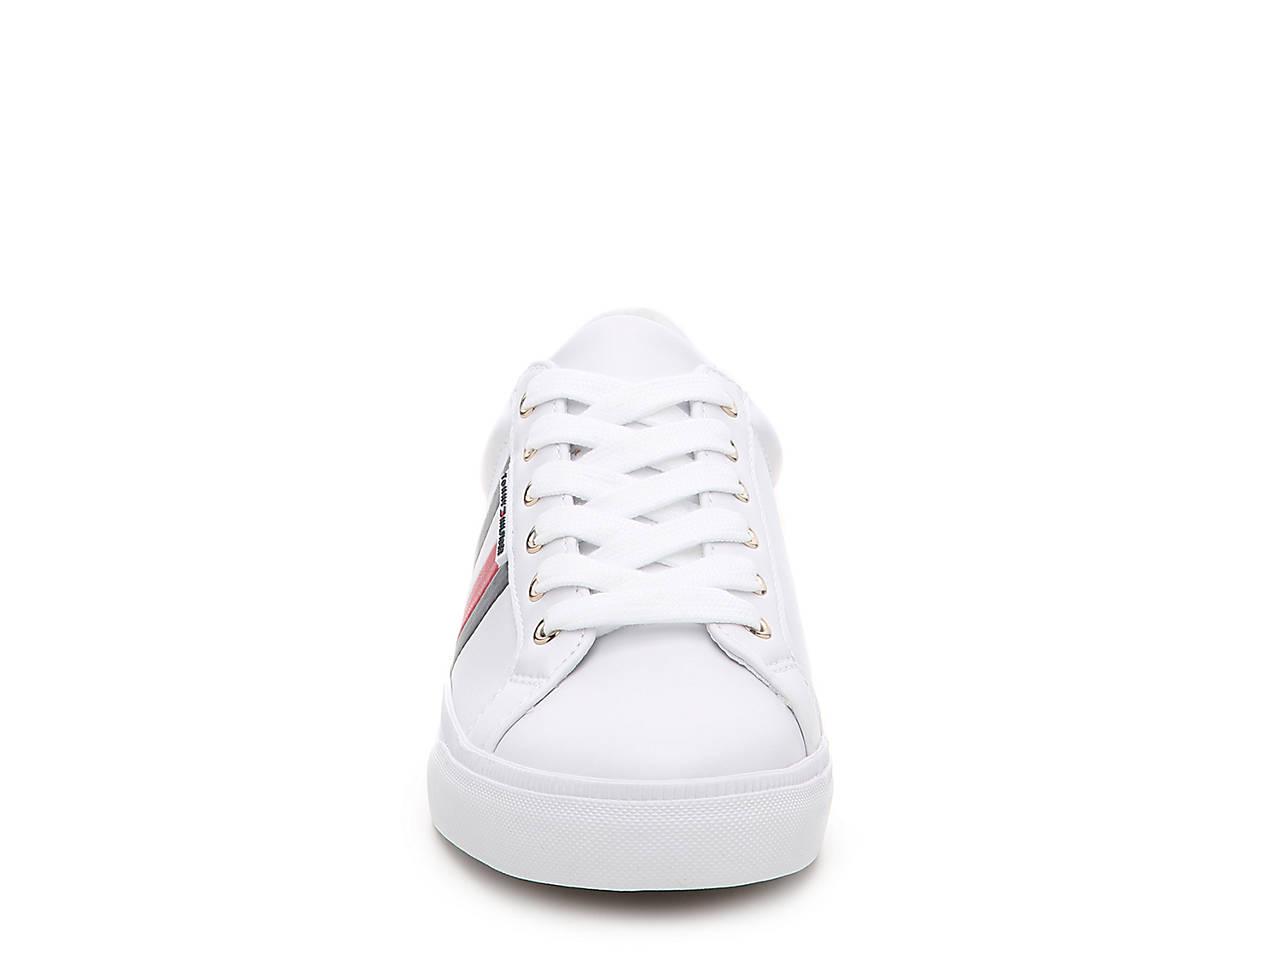 68d912c3a Tommy Hilfiger Lightz Sneaker Women s Shoes